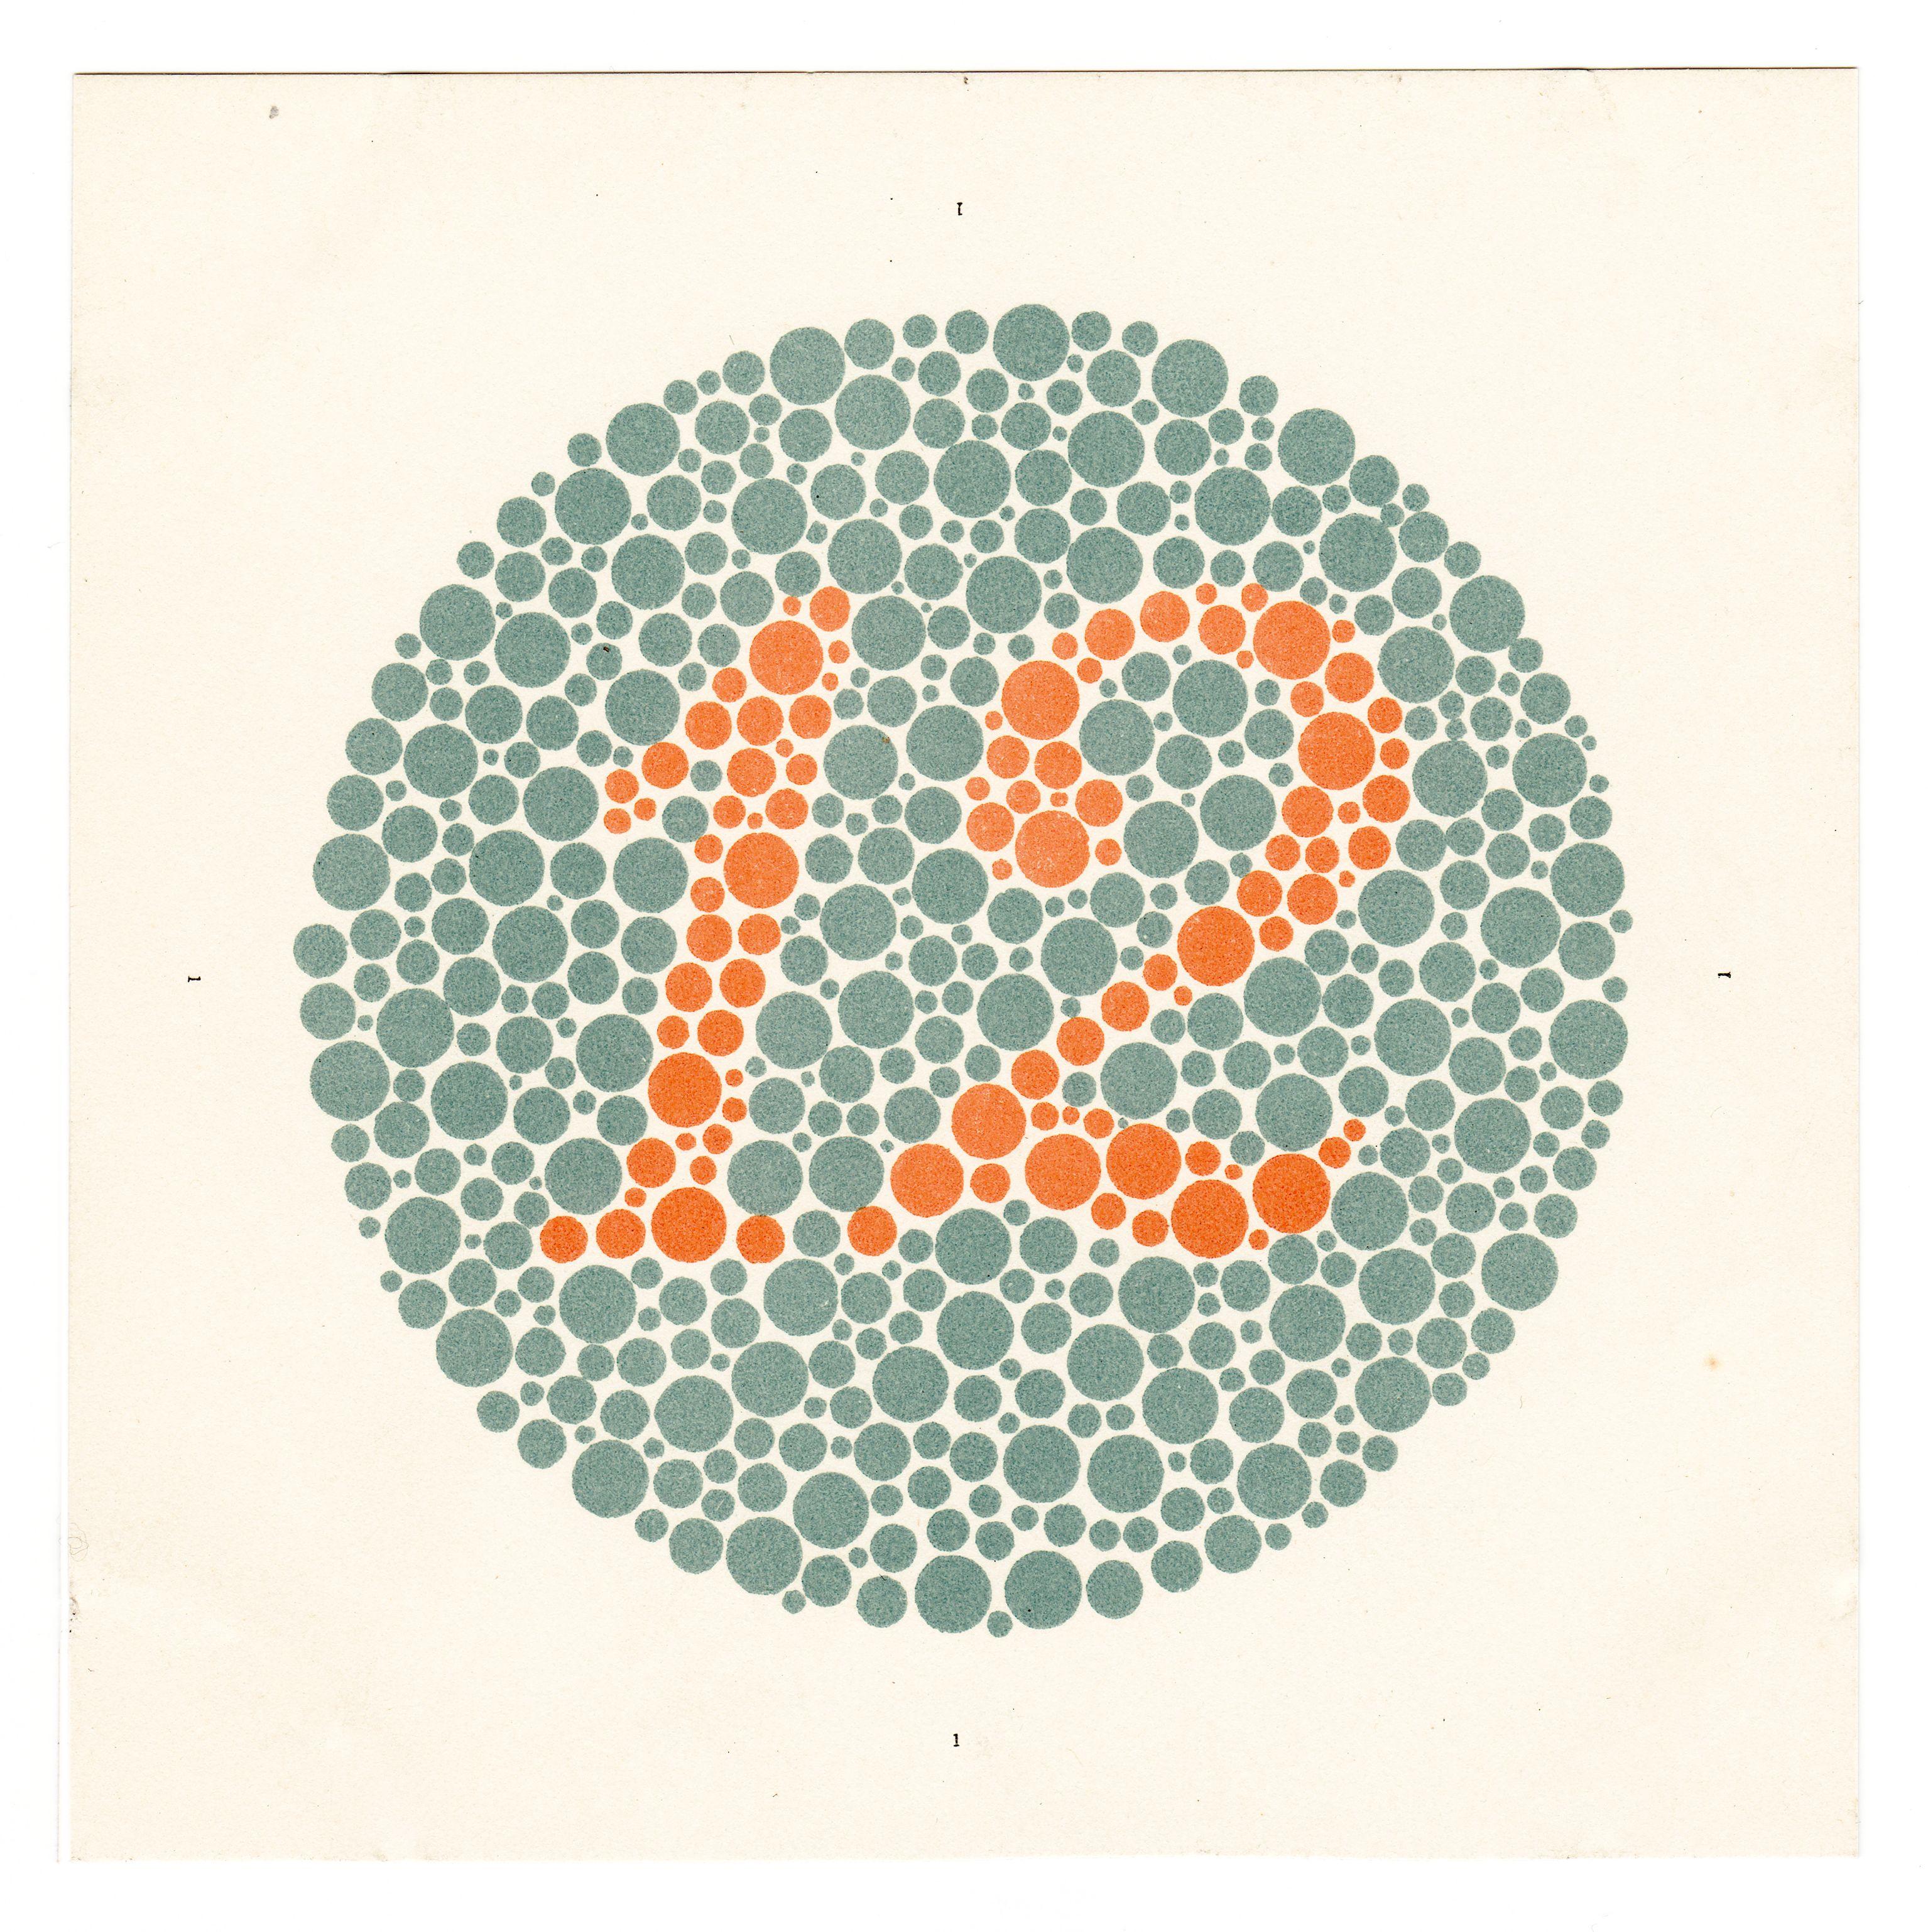 Color Blind Dots